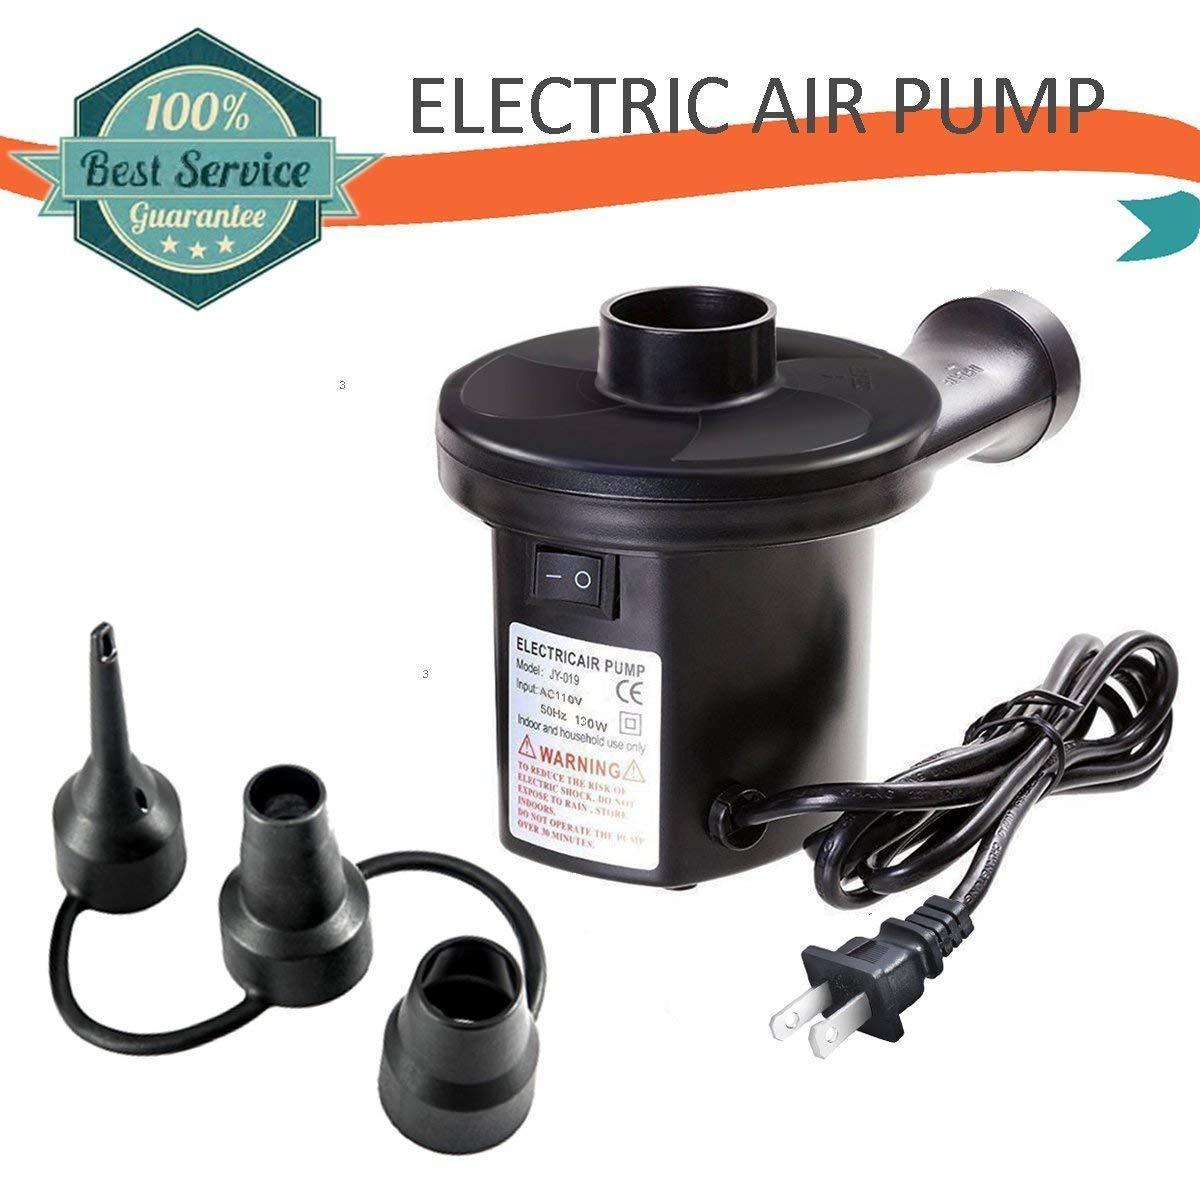 Electric Air Pump iWeller